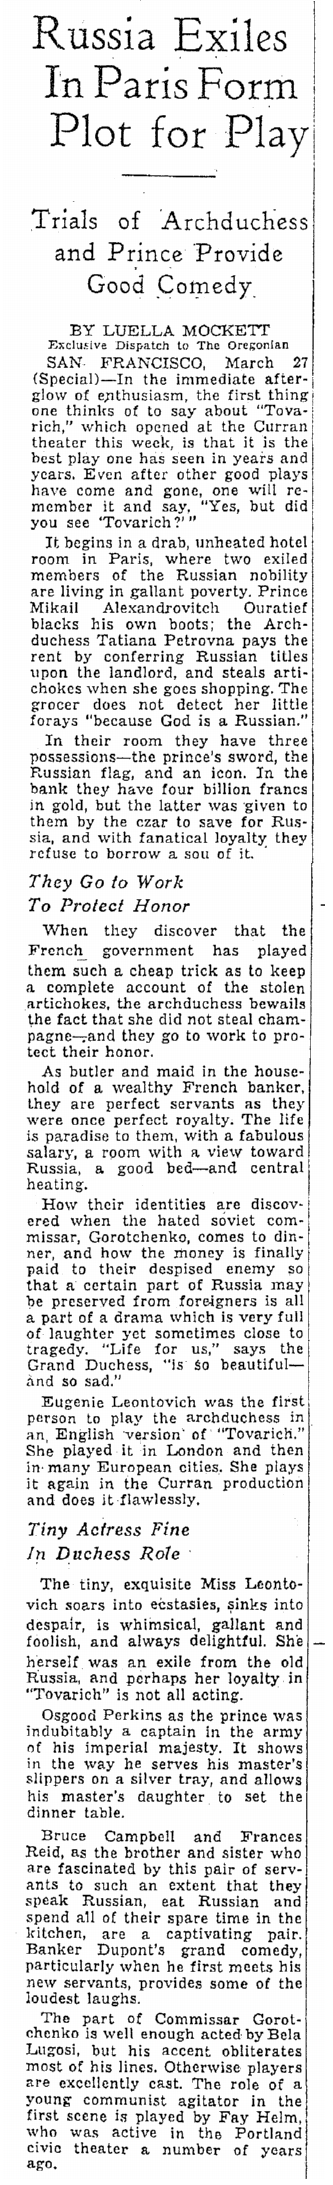 Tovarich, Oregonian, March 28, 1937